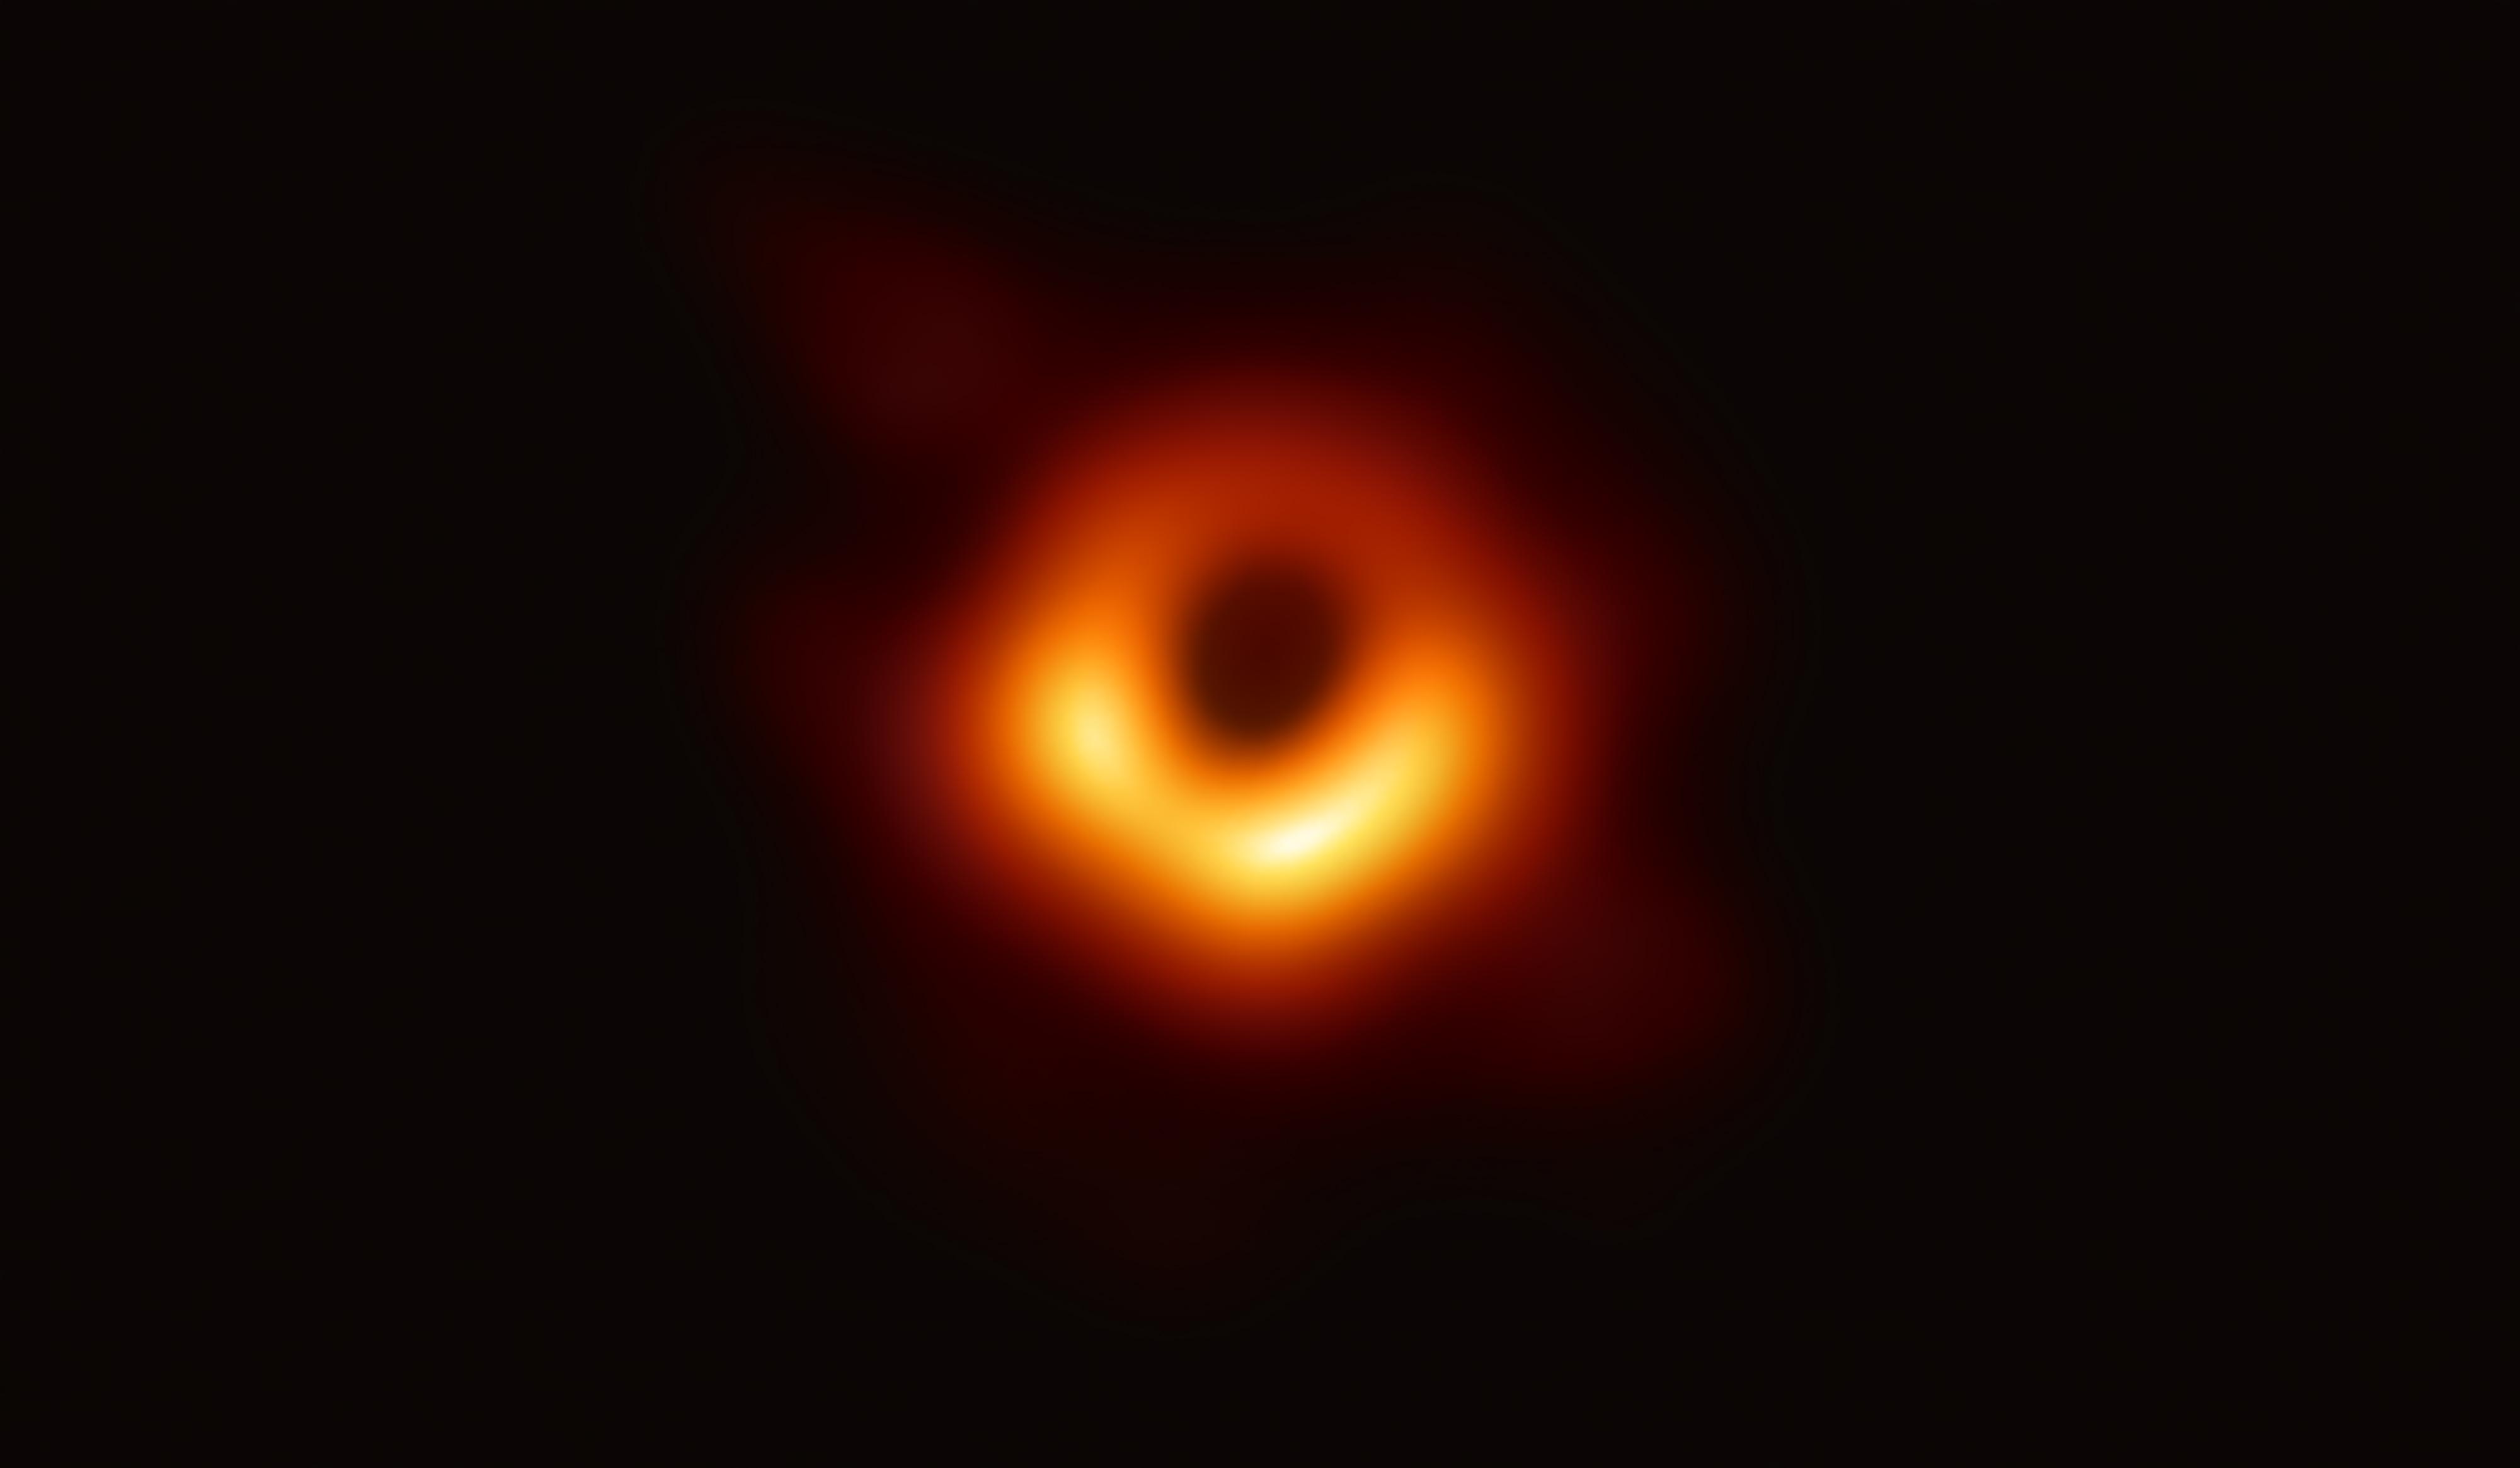 black hole shadow M87